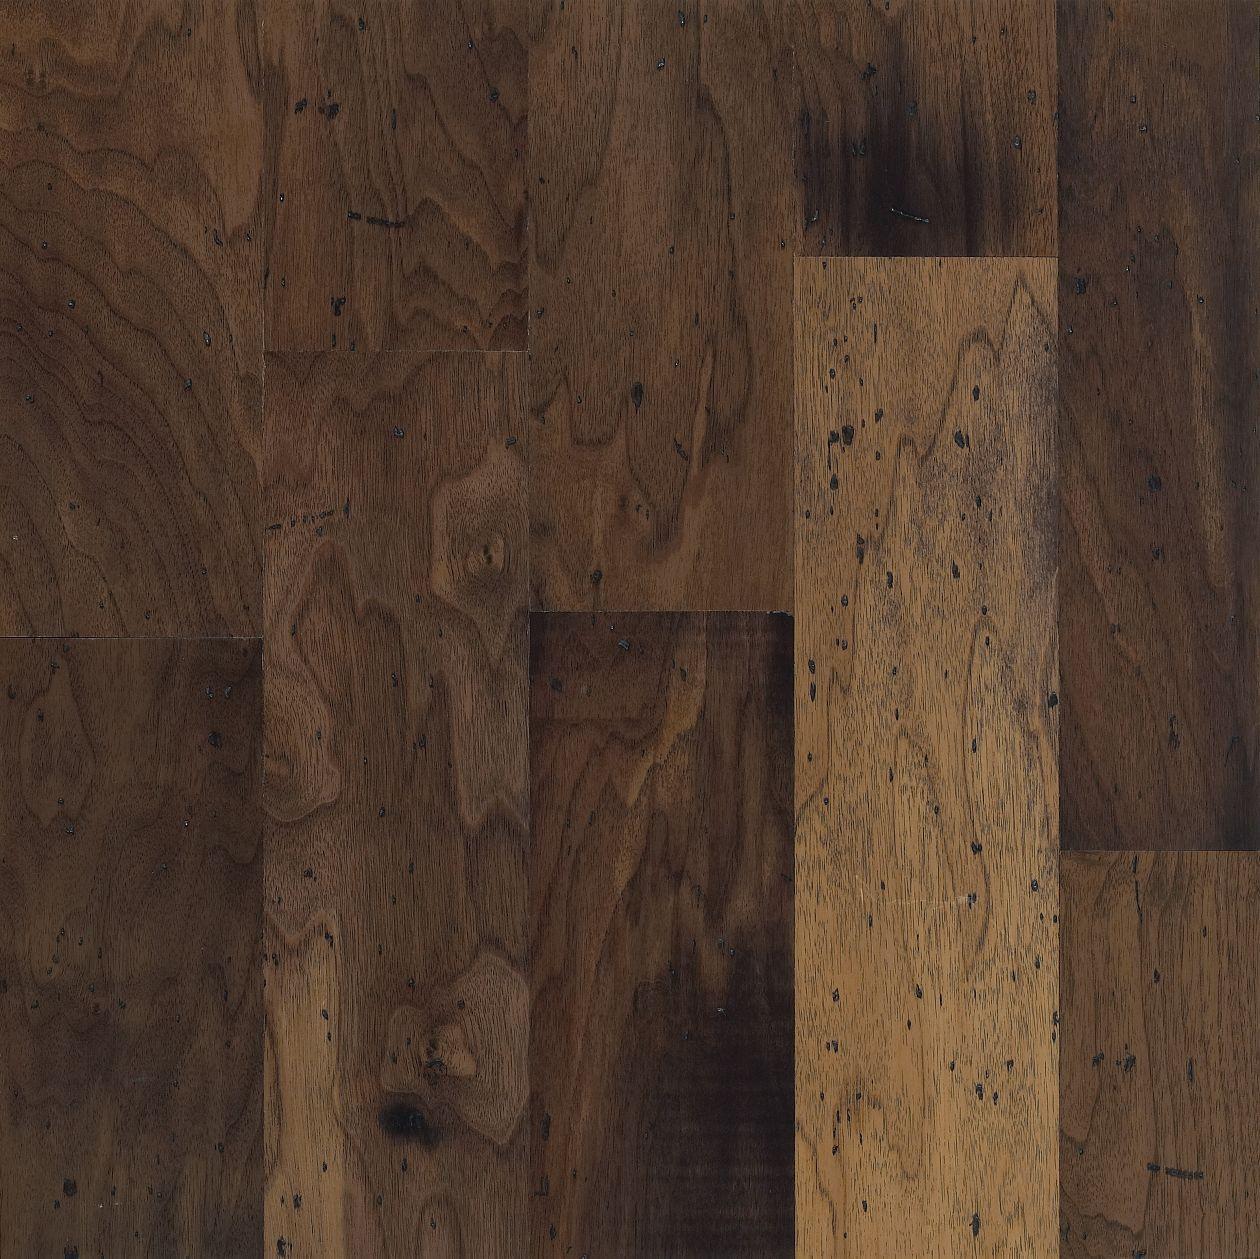 Engineered Parquet Flooring / Glued / Floating / Walnut WALNUT: ANTIQUE  NATURAL Armstrong Flooring